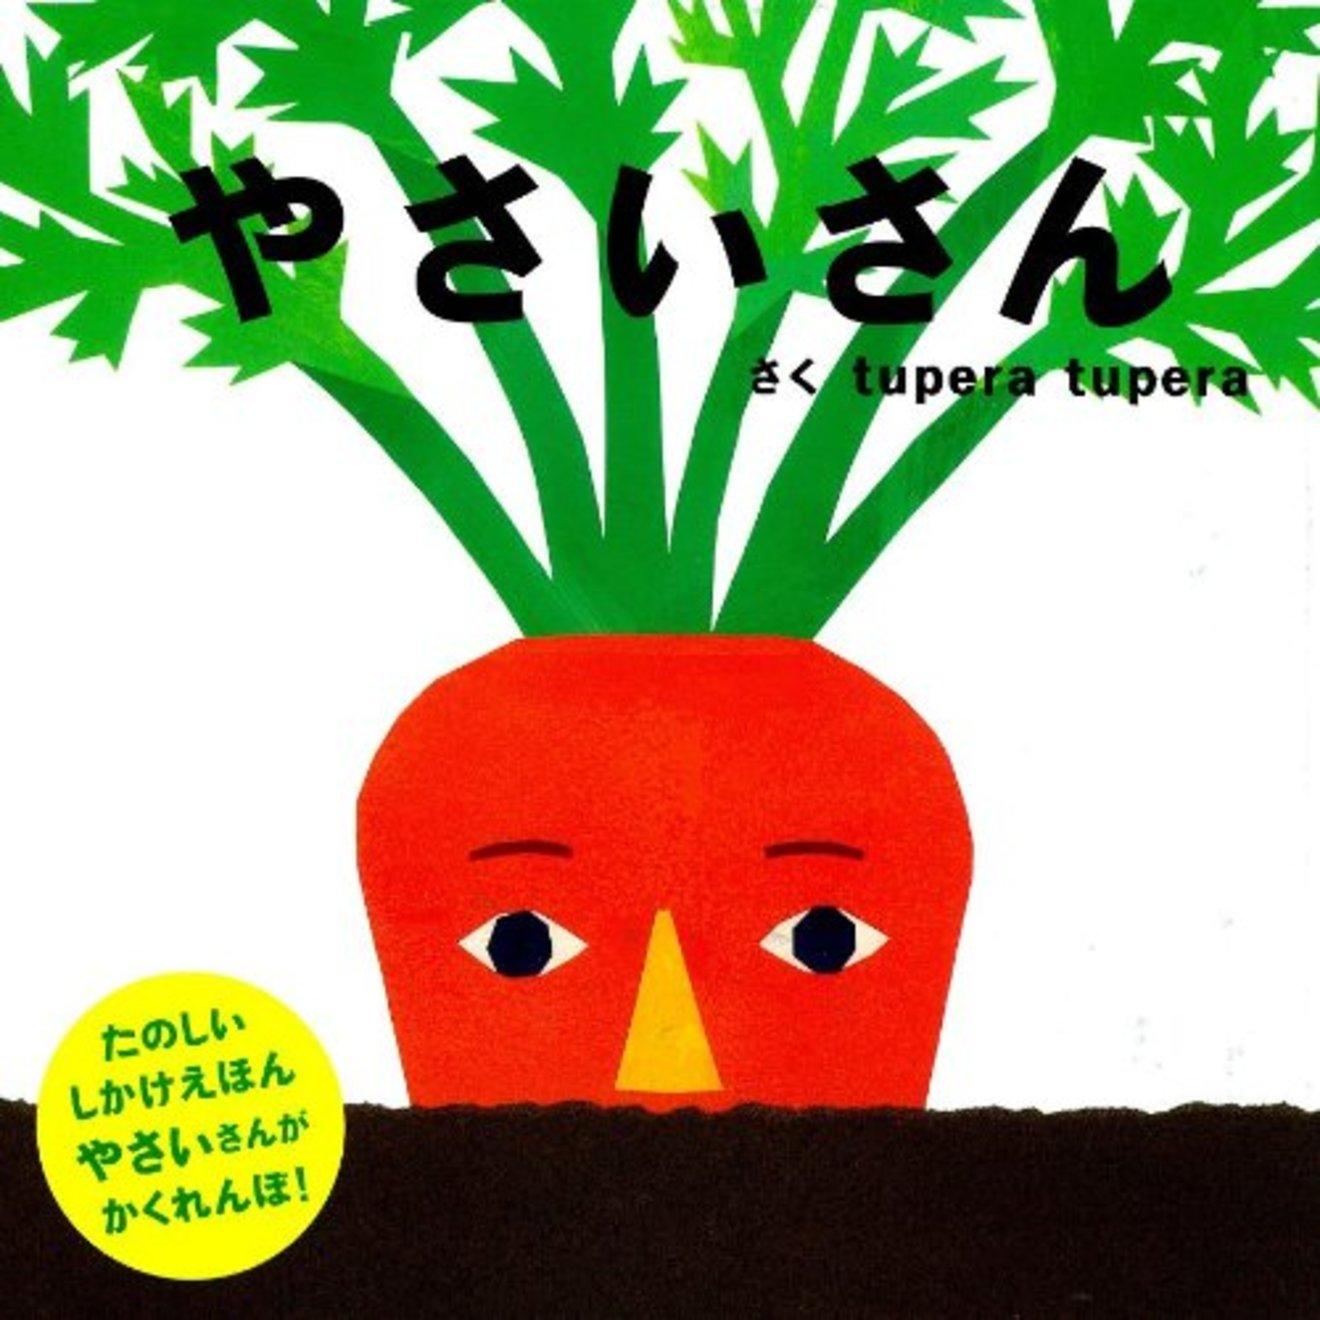 tupera tupera(ツぺラ ツぺラ)のおすすめ絵本5選!